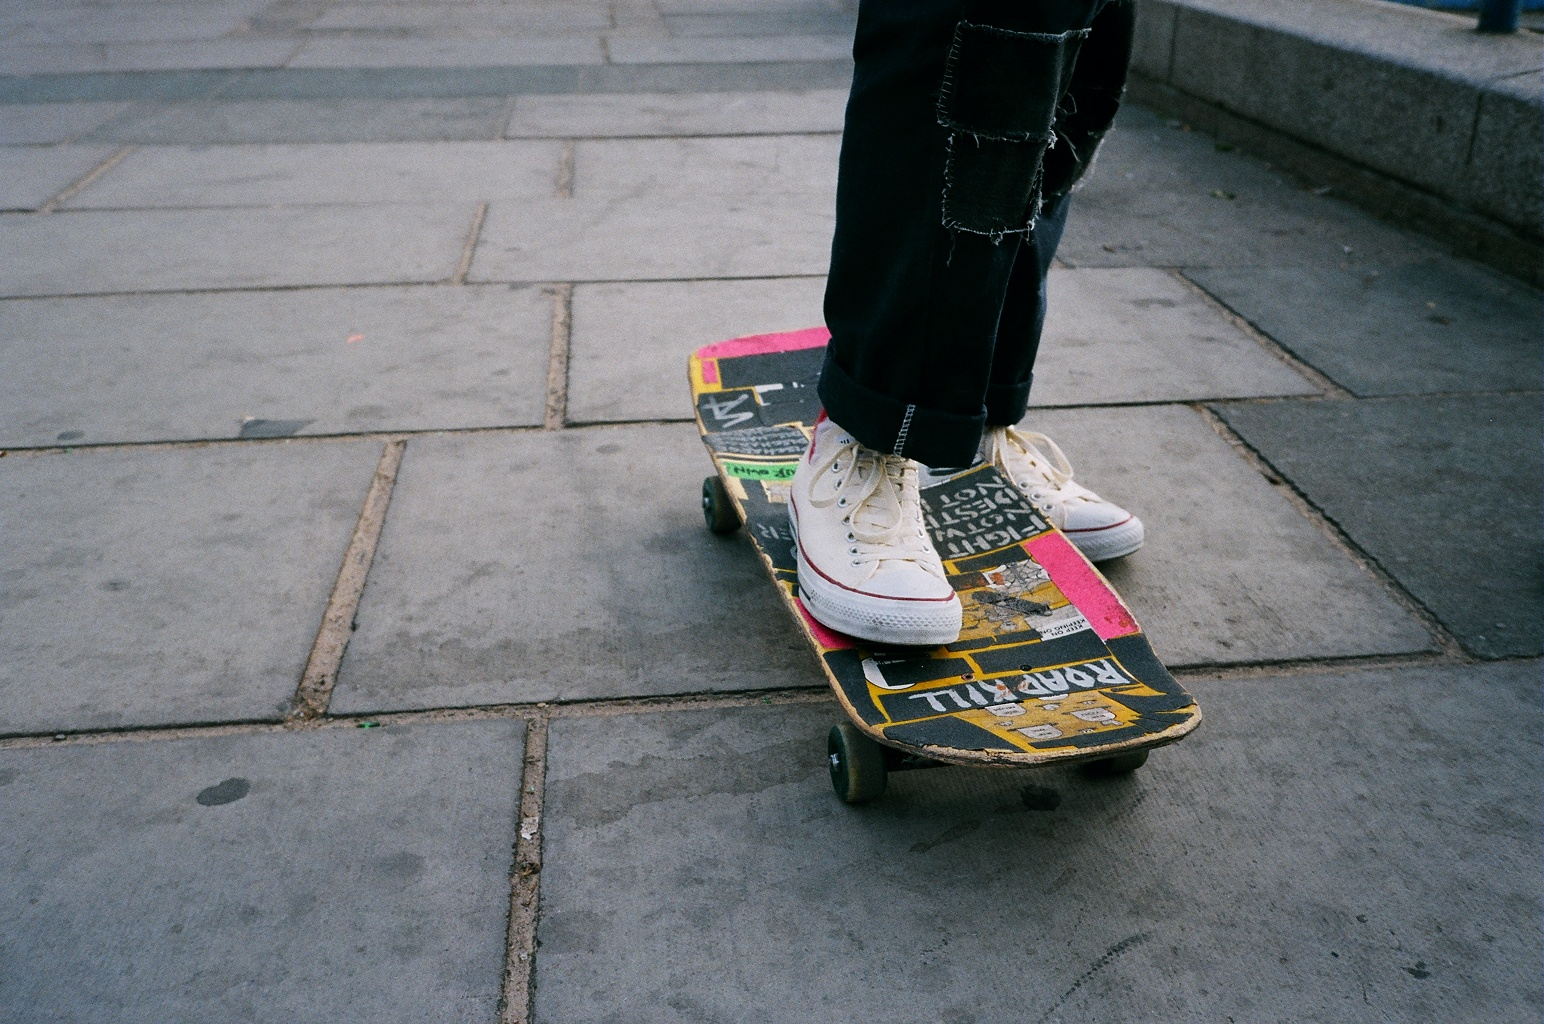 Skateboard_LLSB